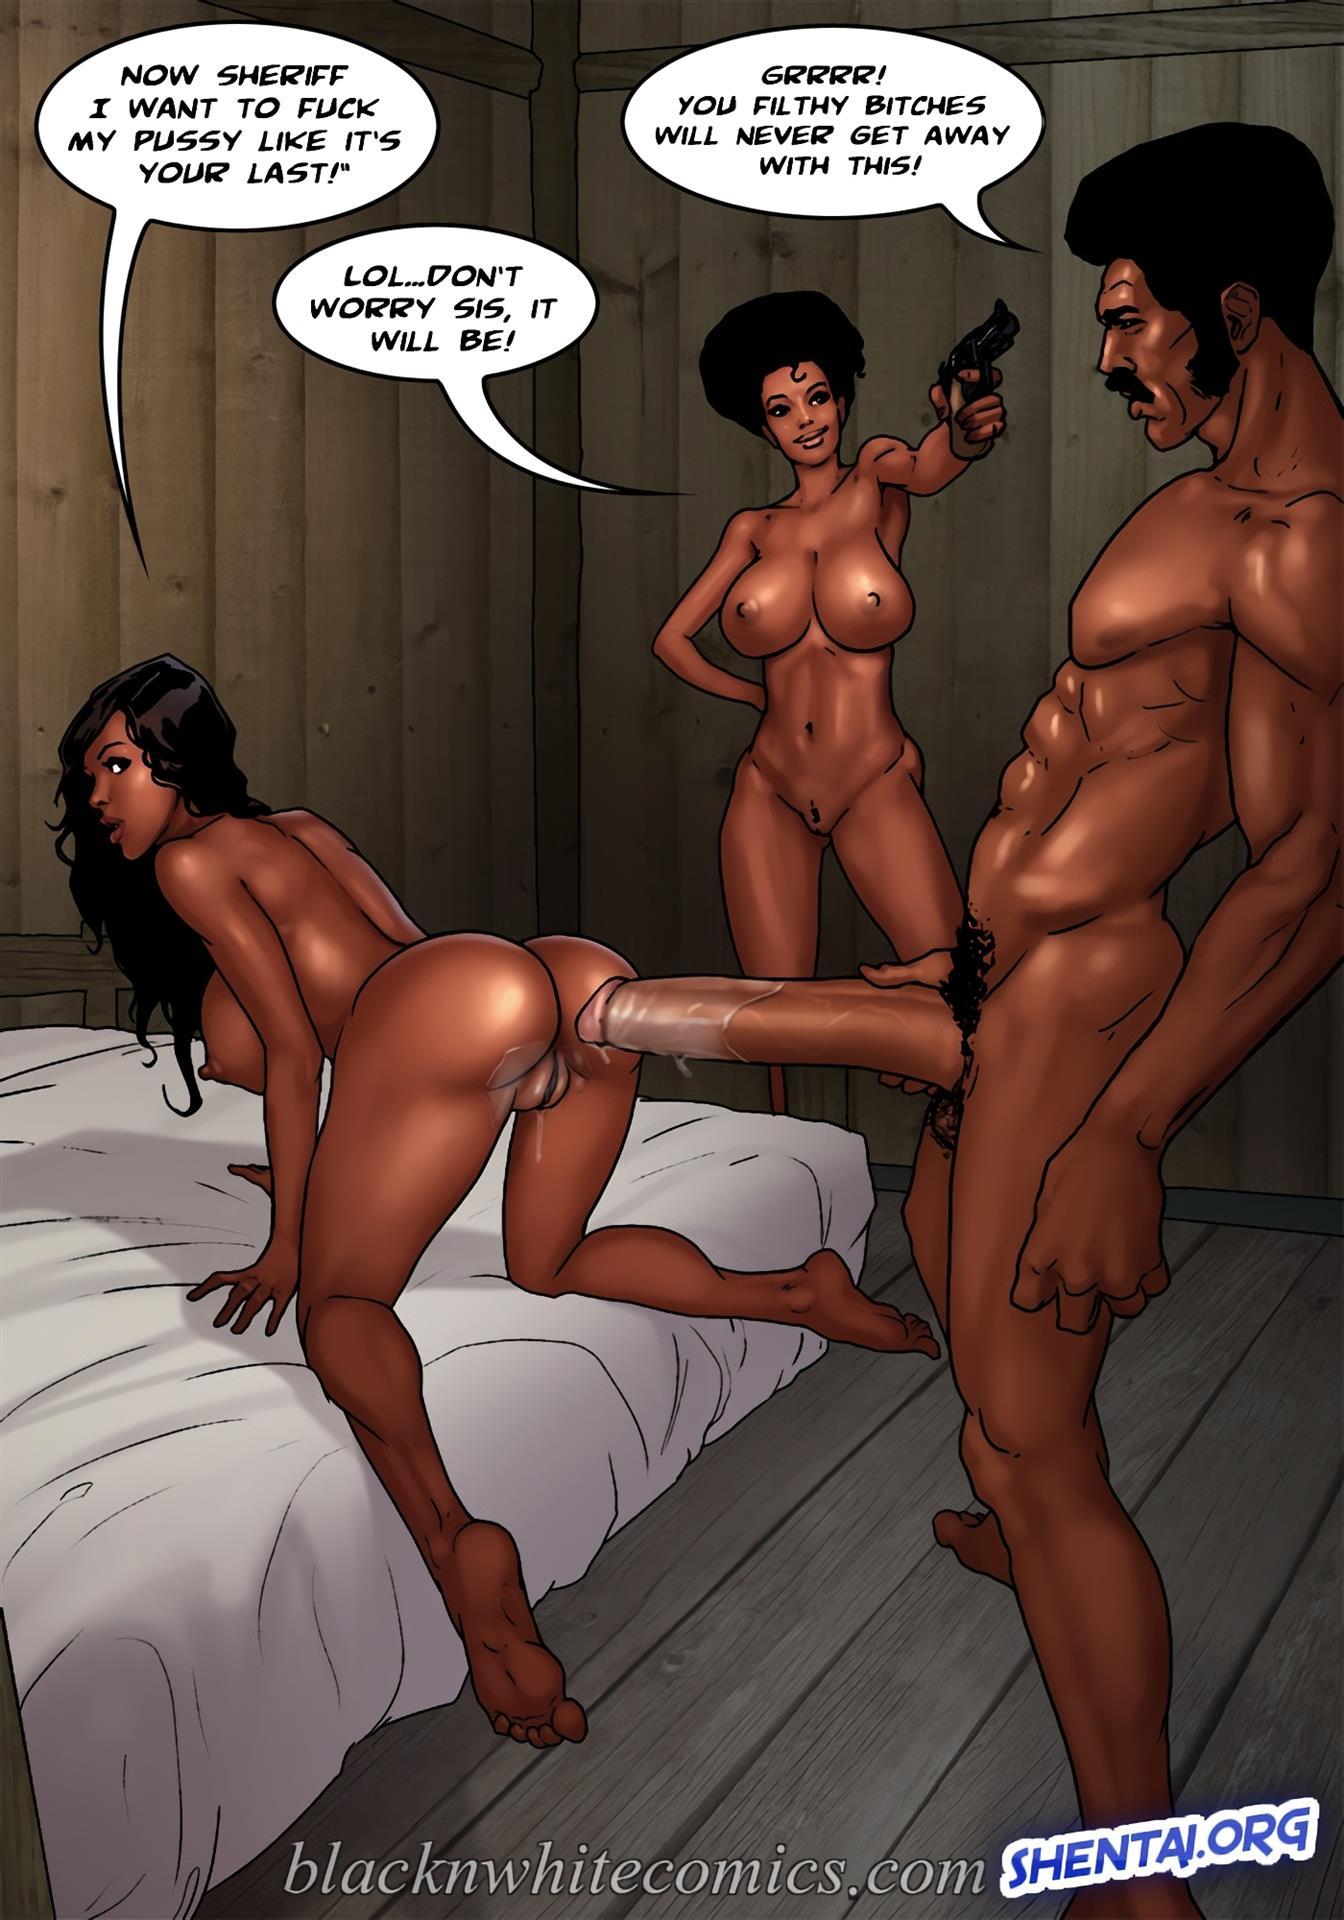 True Dick [BlackNwhite]